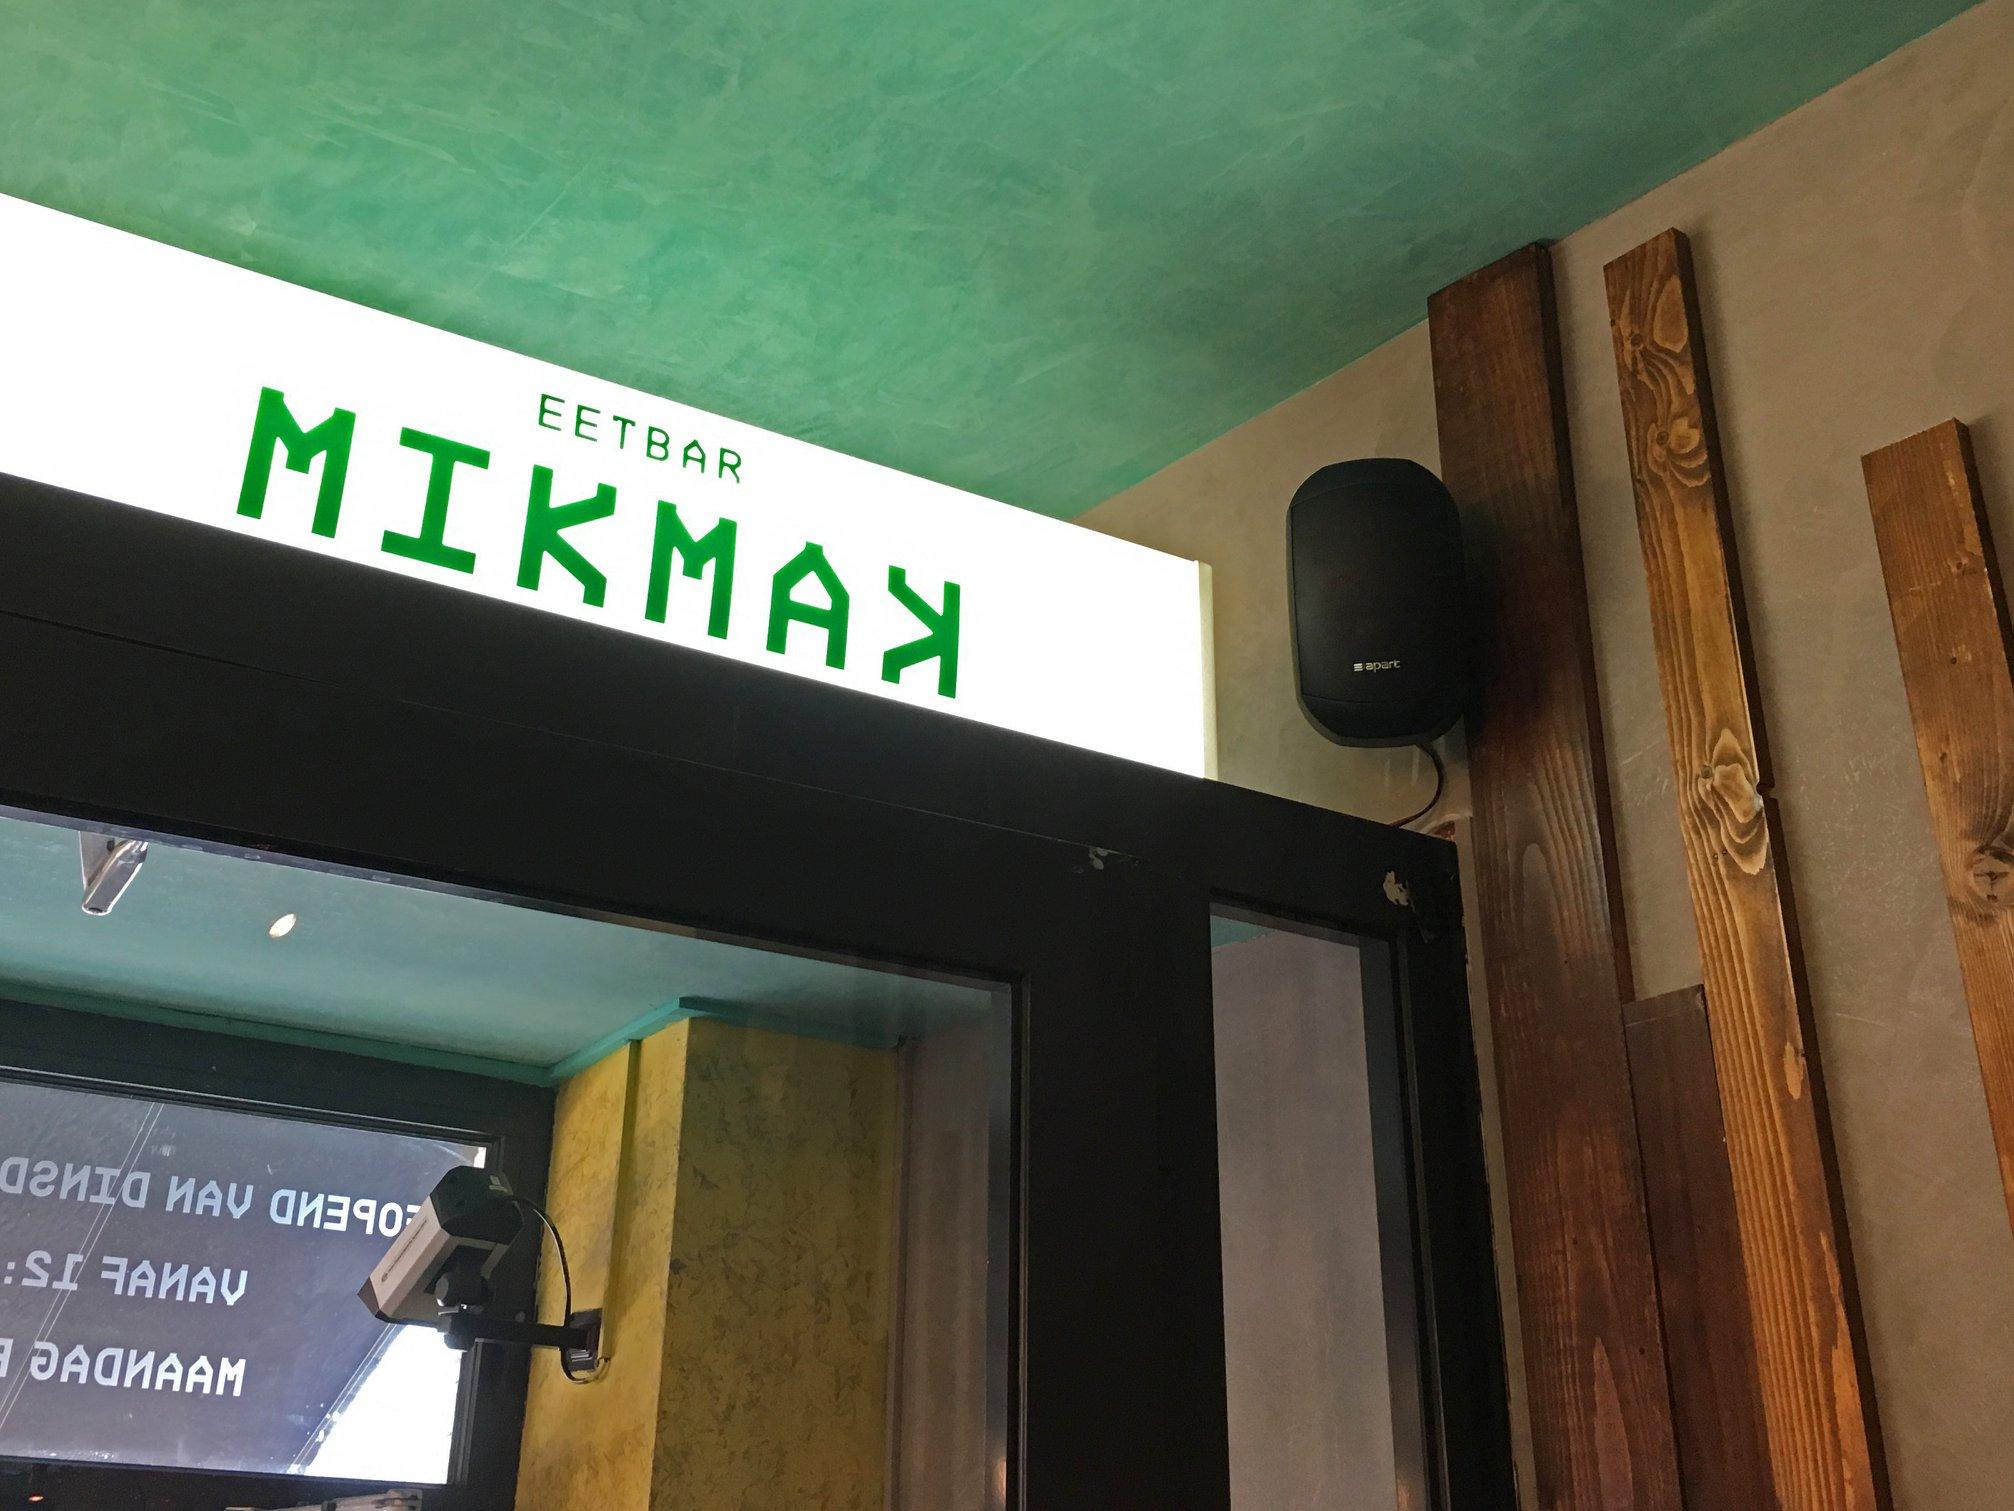 Eetbar MikMAK